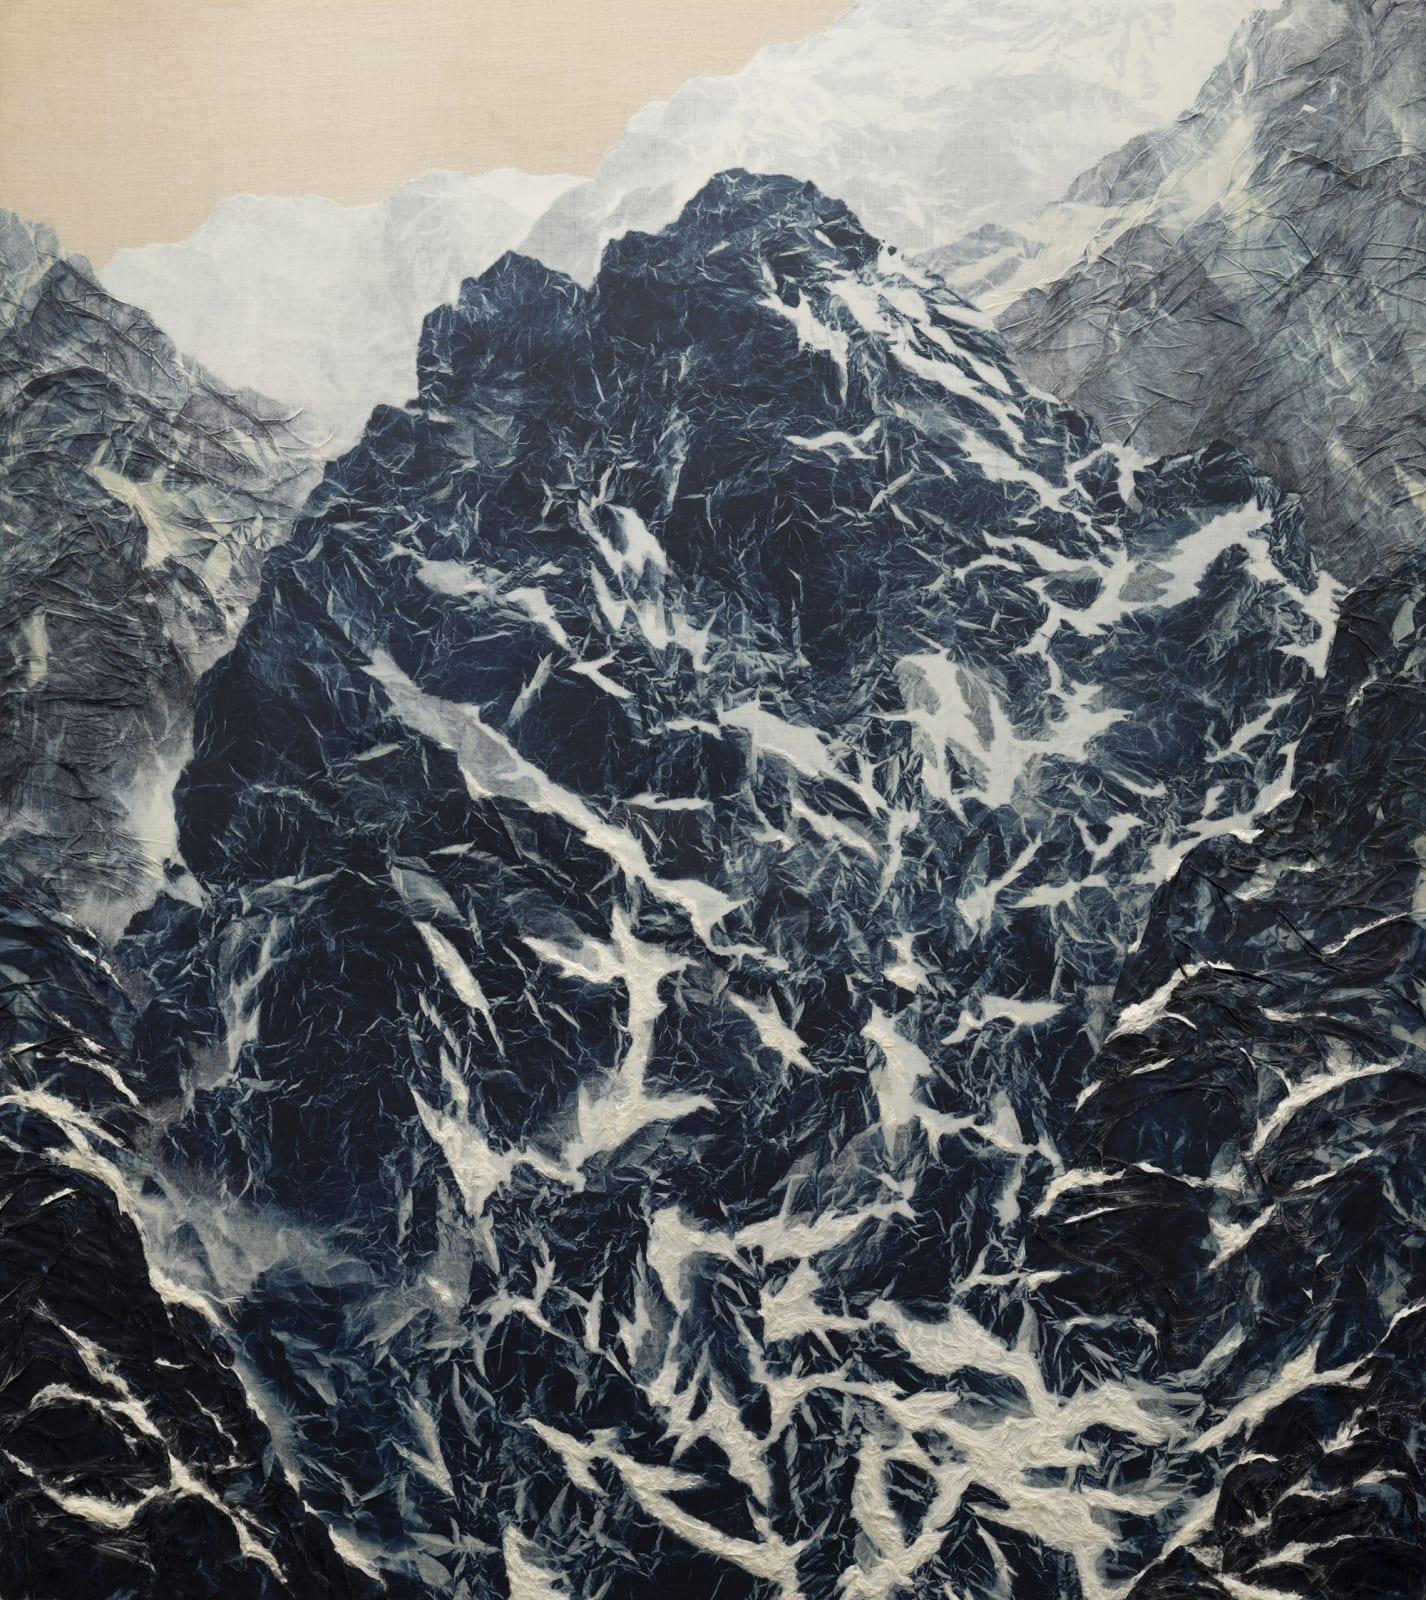 Wu Chi-Tsung 吳季璁, Cyano-Collage 083 氰山集之八十三, 2020